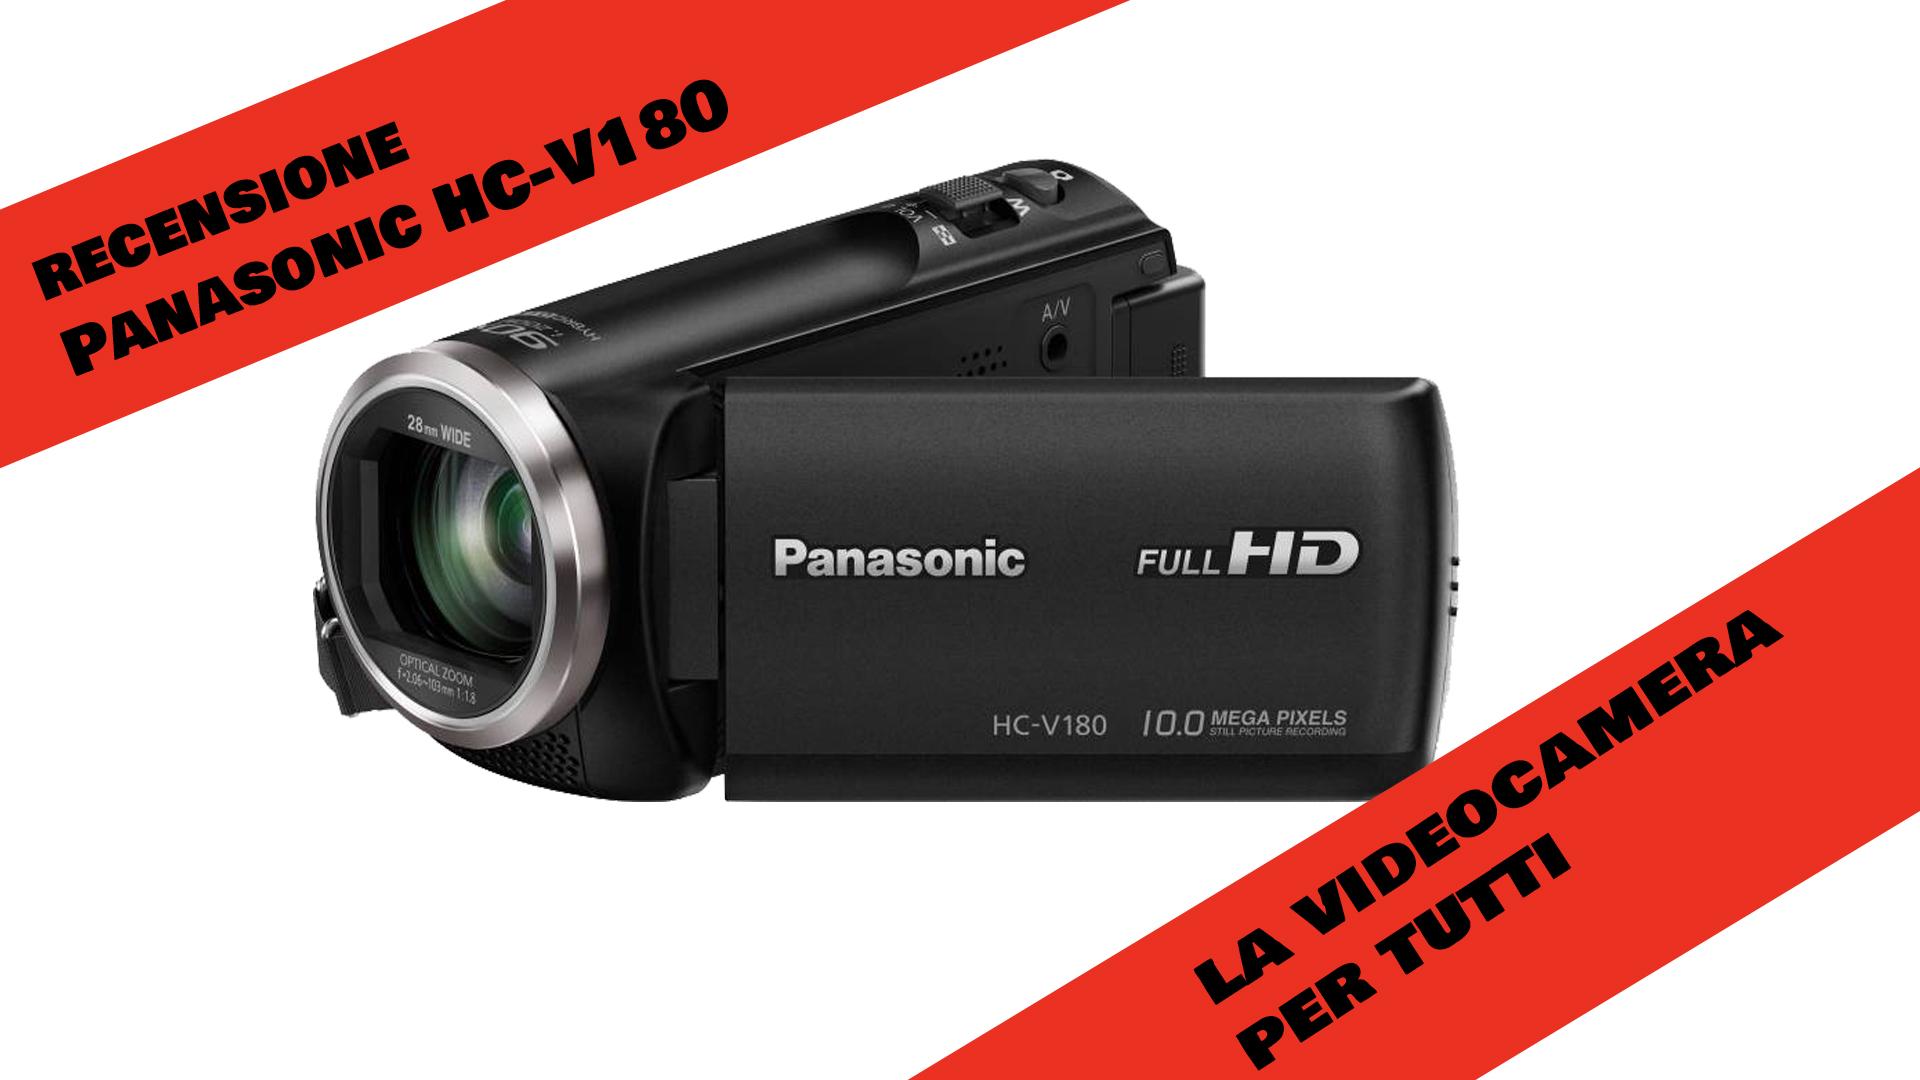 Recensione Panasonic HC-V180